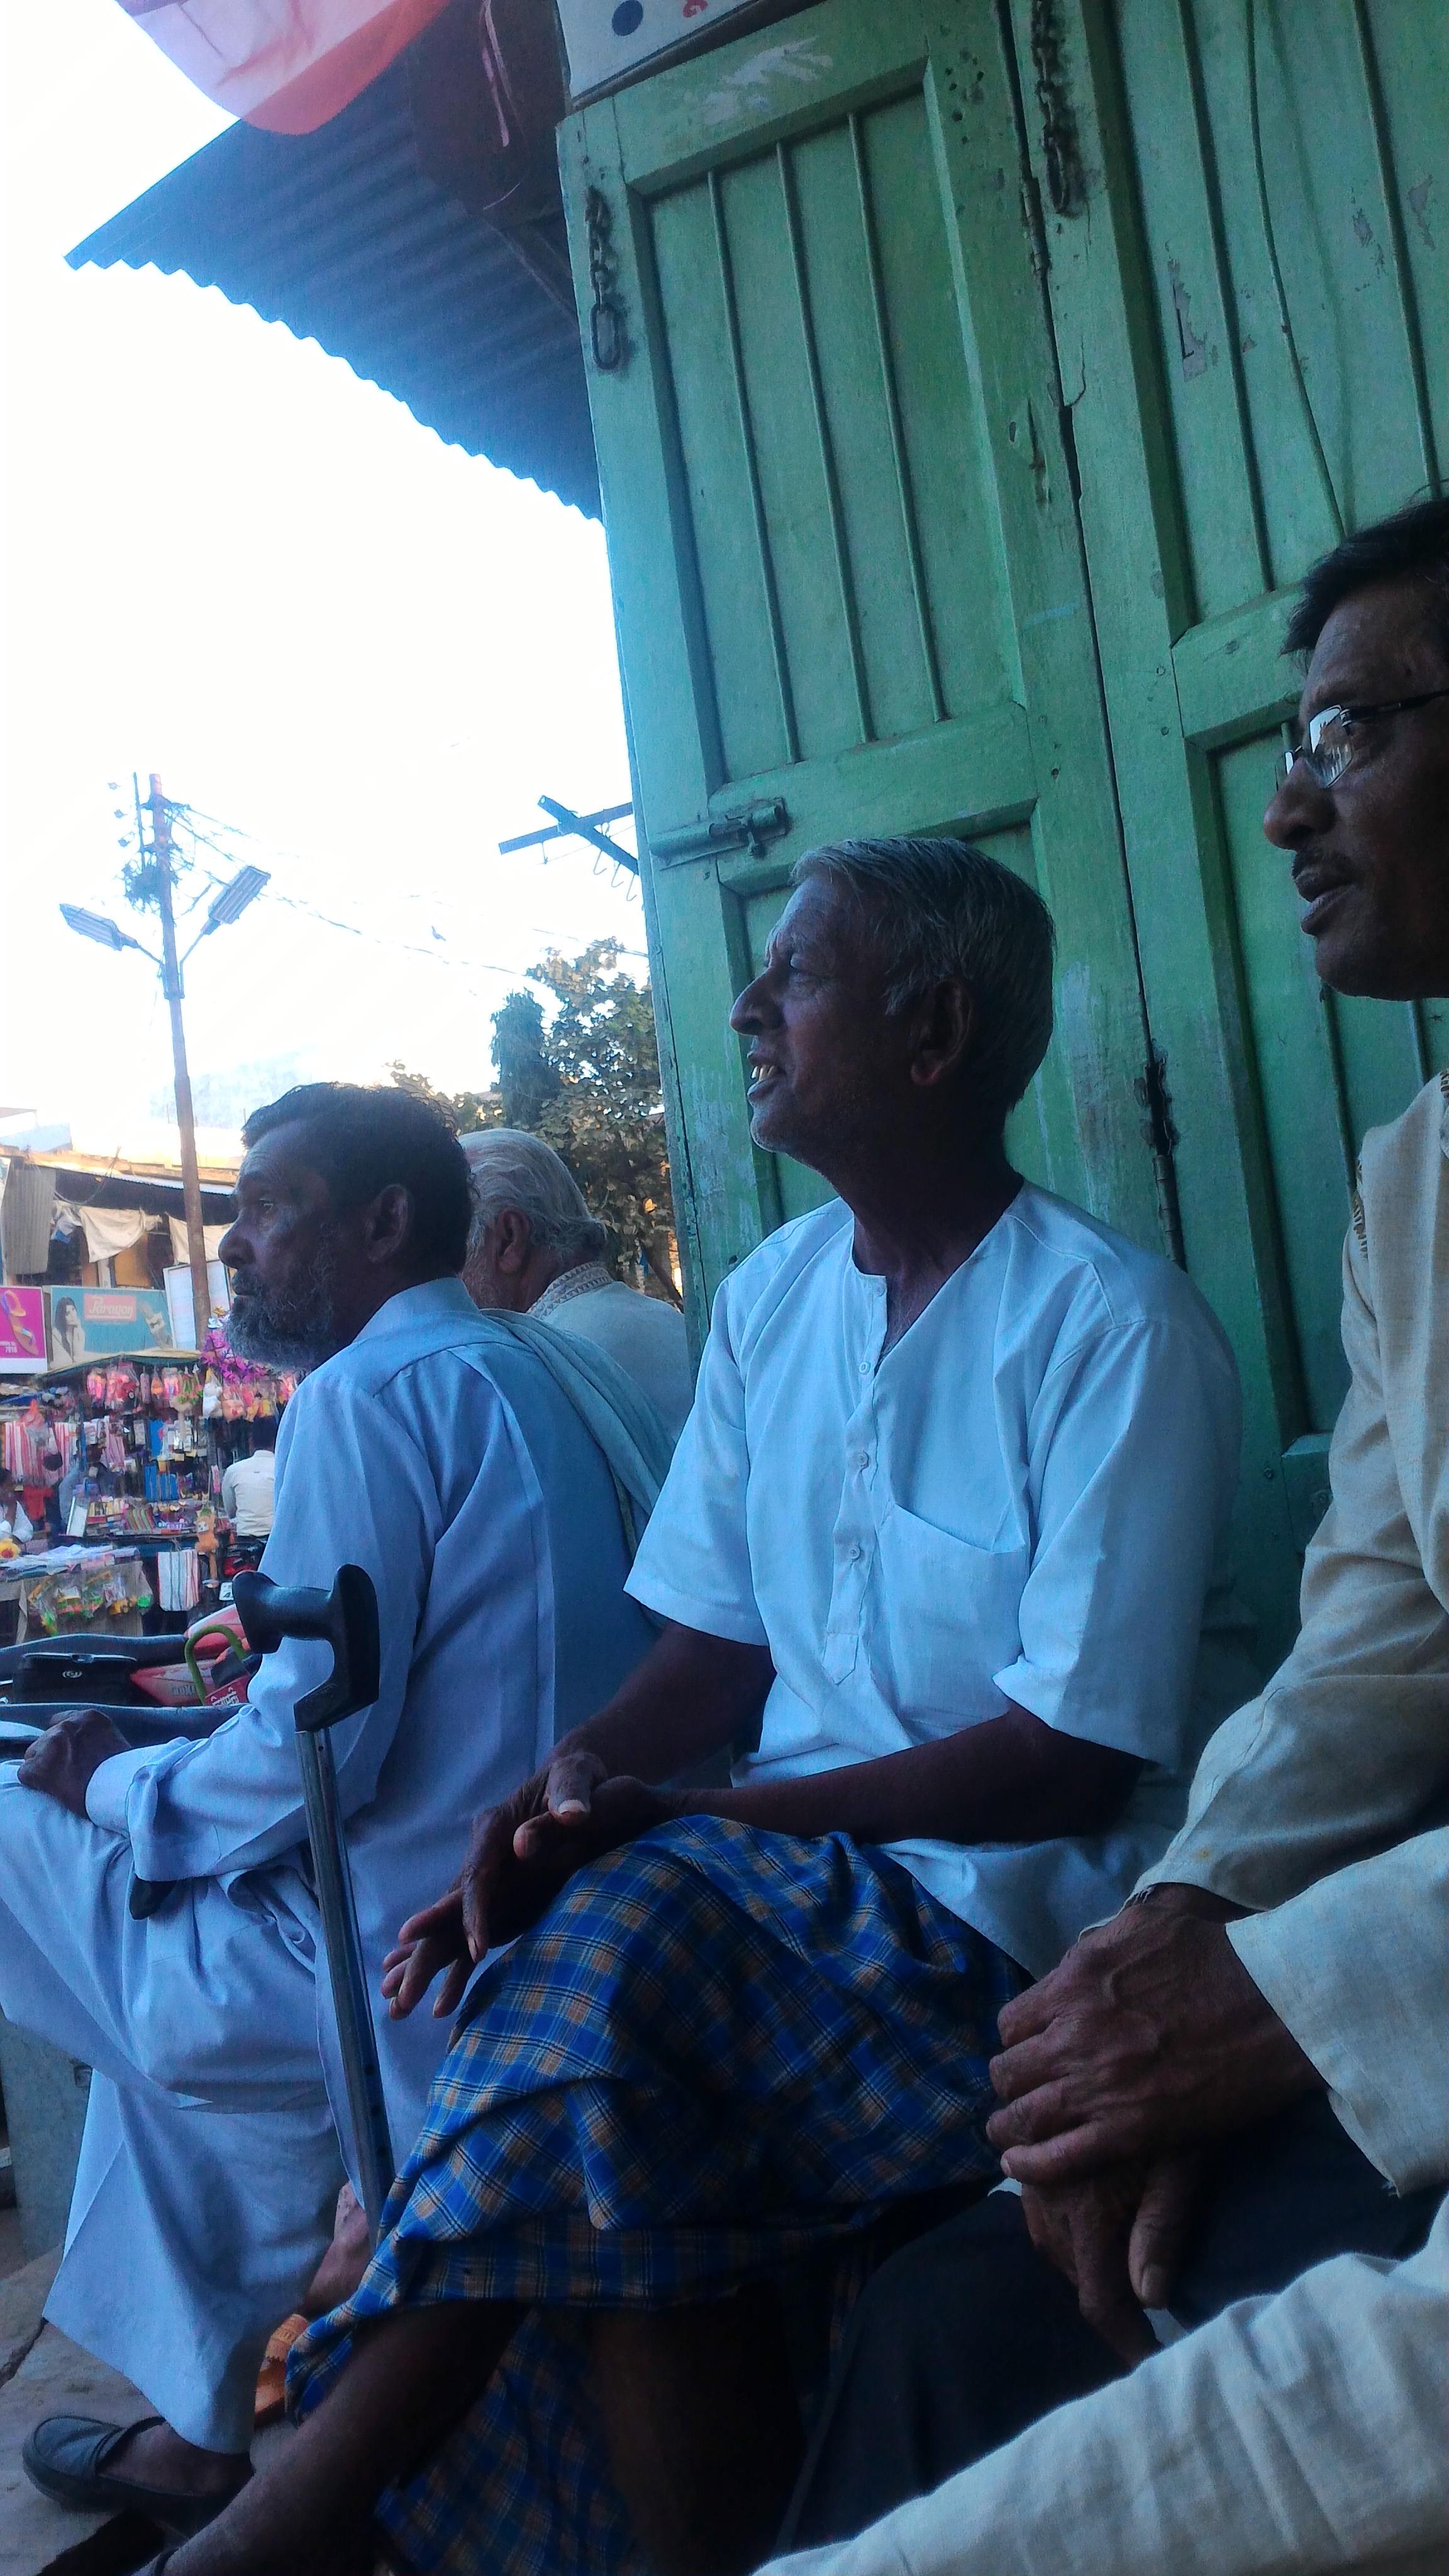 Radheyshyam Gupta (Centre) in conversation with the local Researcher Narendra Maurya (Right)